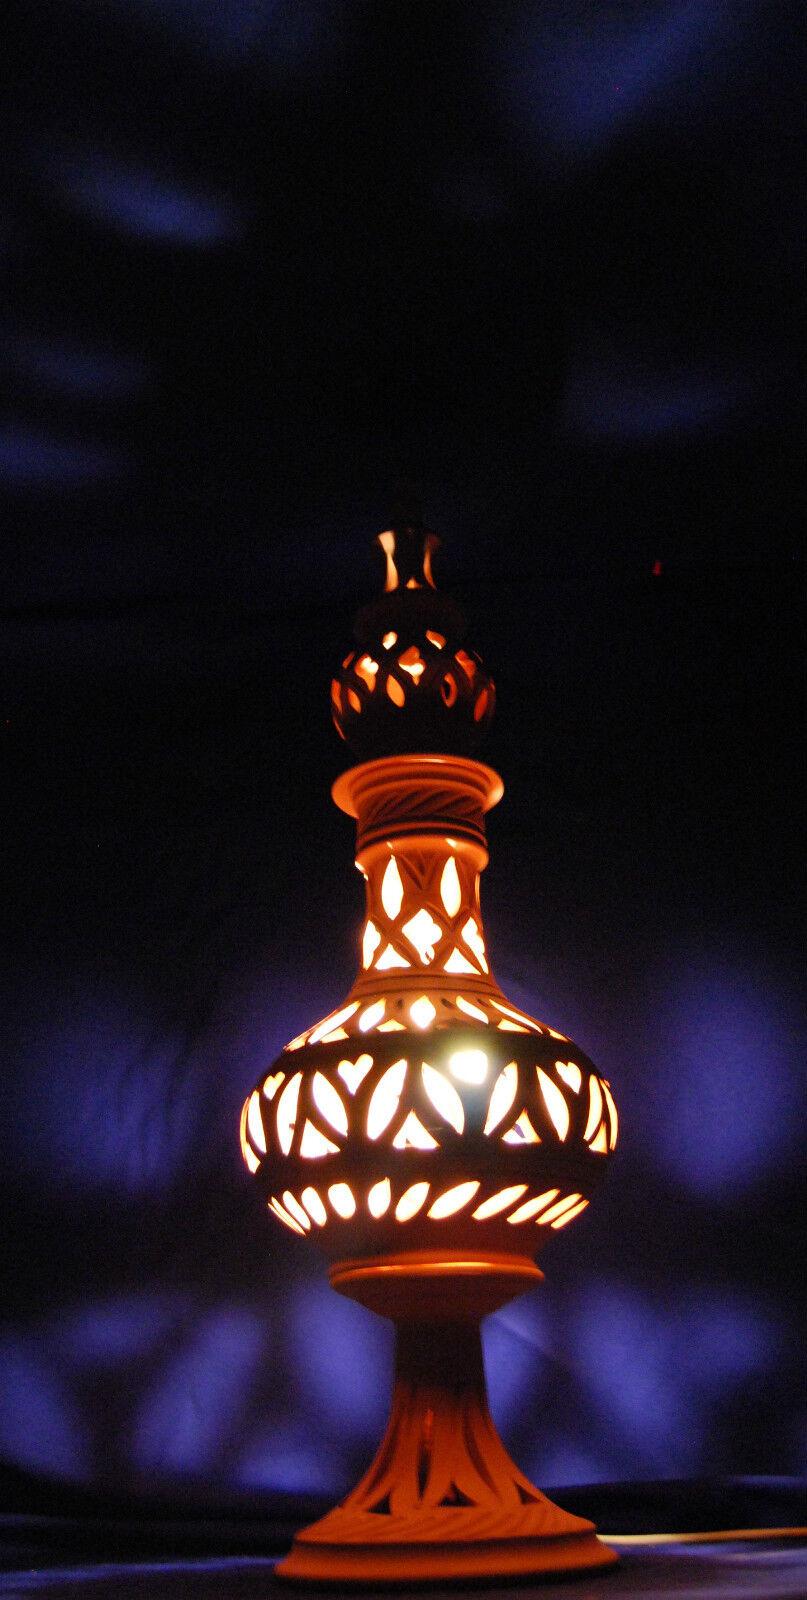 windlicht lampe laterne aus terracotta terrakotta 70 cm f r garten innenraum eur 29 00. Black Bedroom Furniture Sets. Home Design Ideas